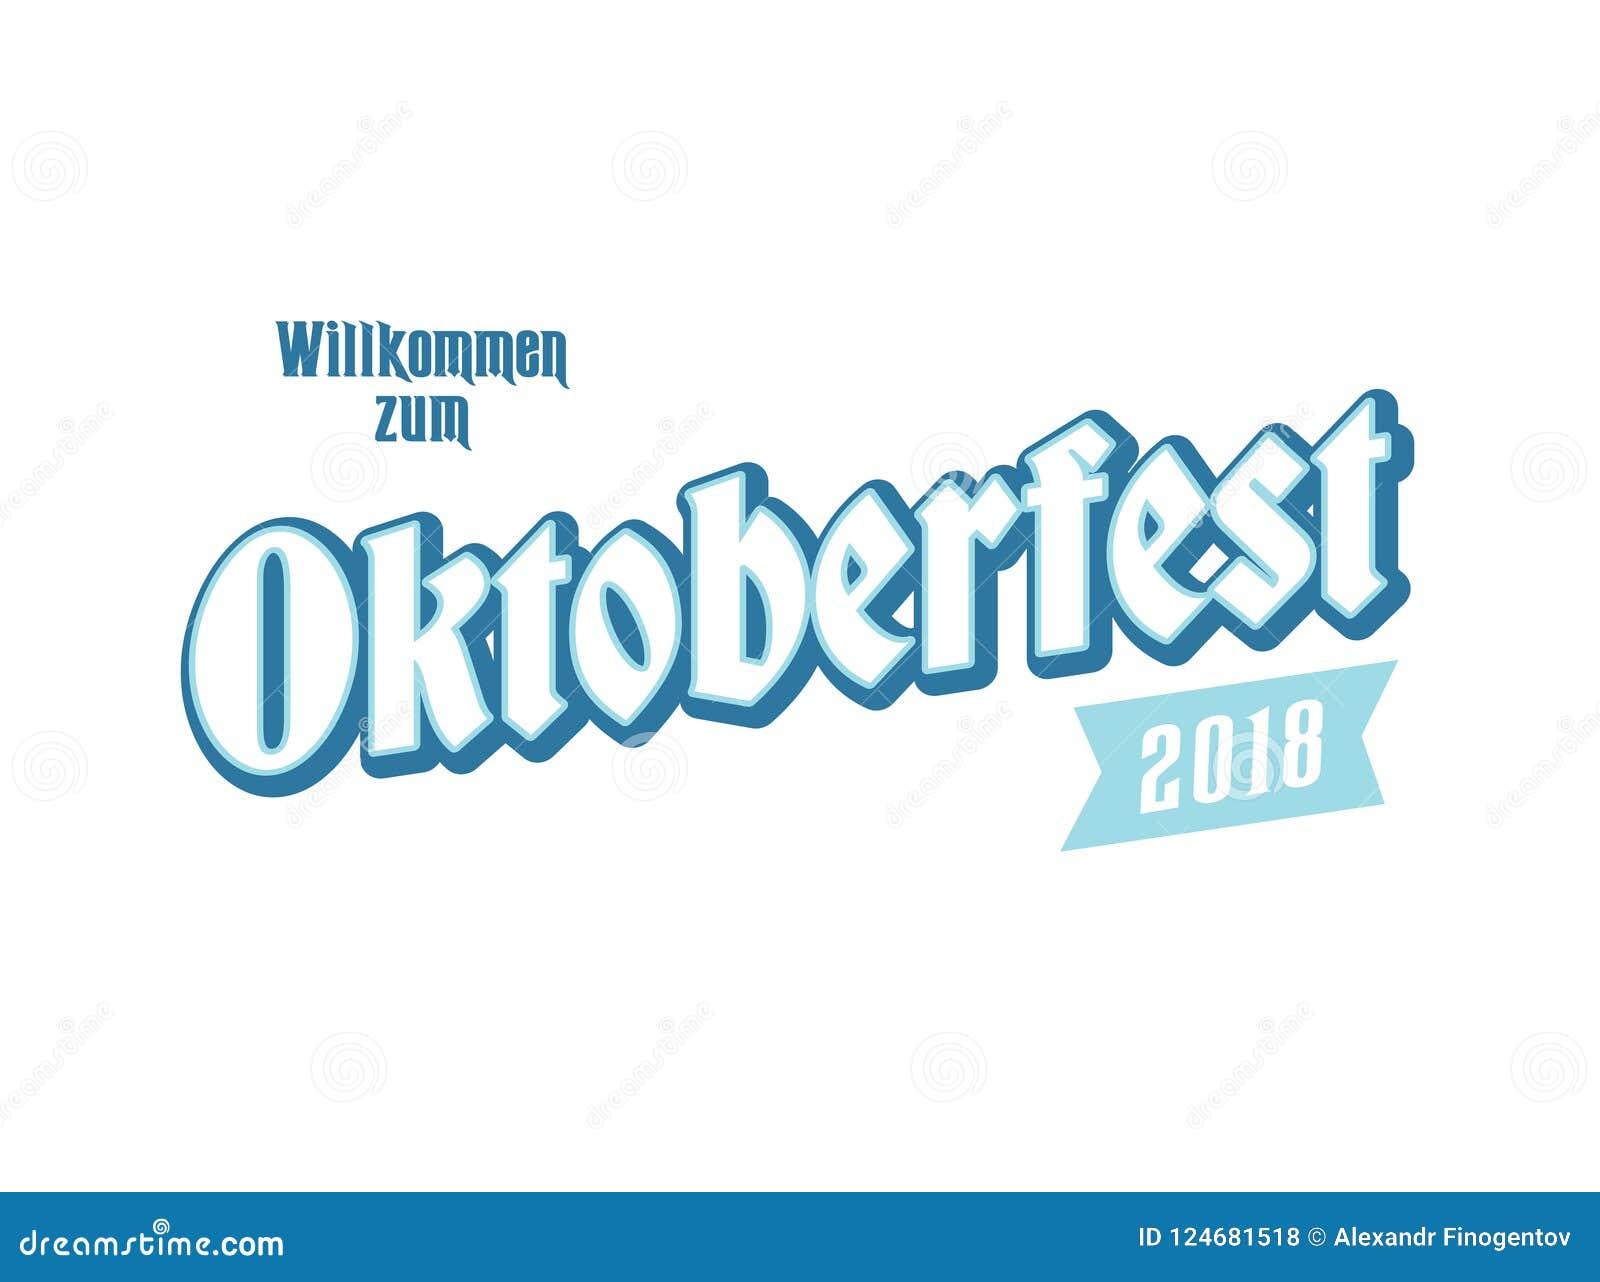 Oktoberfest Label Oktoberfest Typography Logo For Greeting Cards